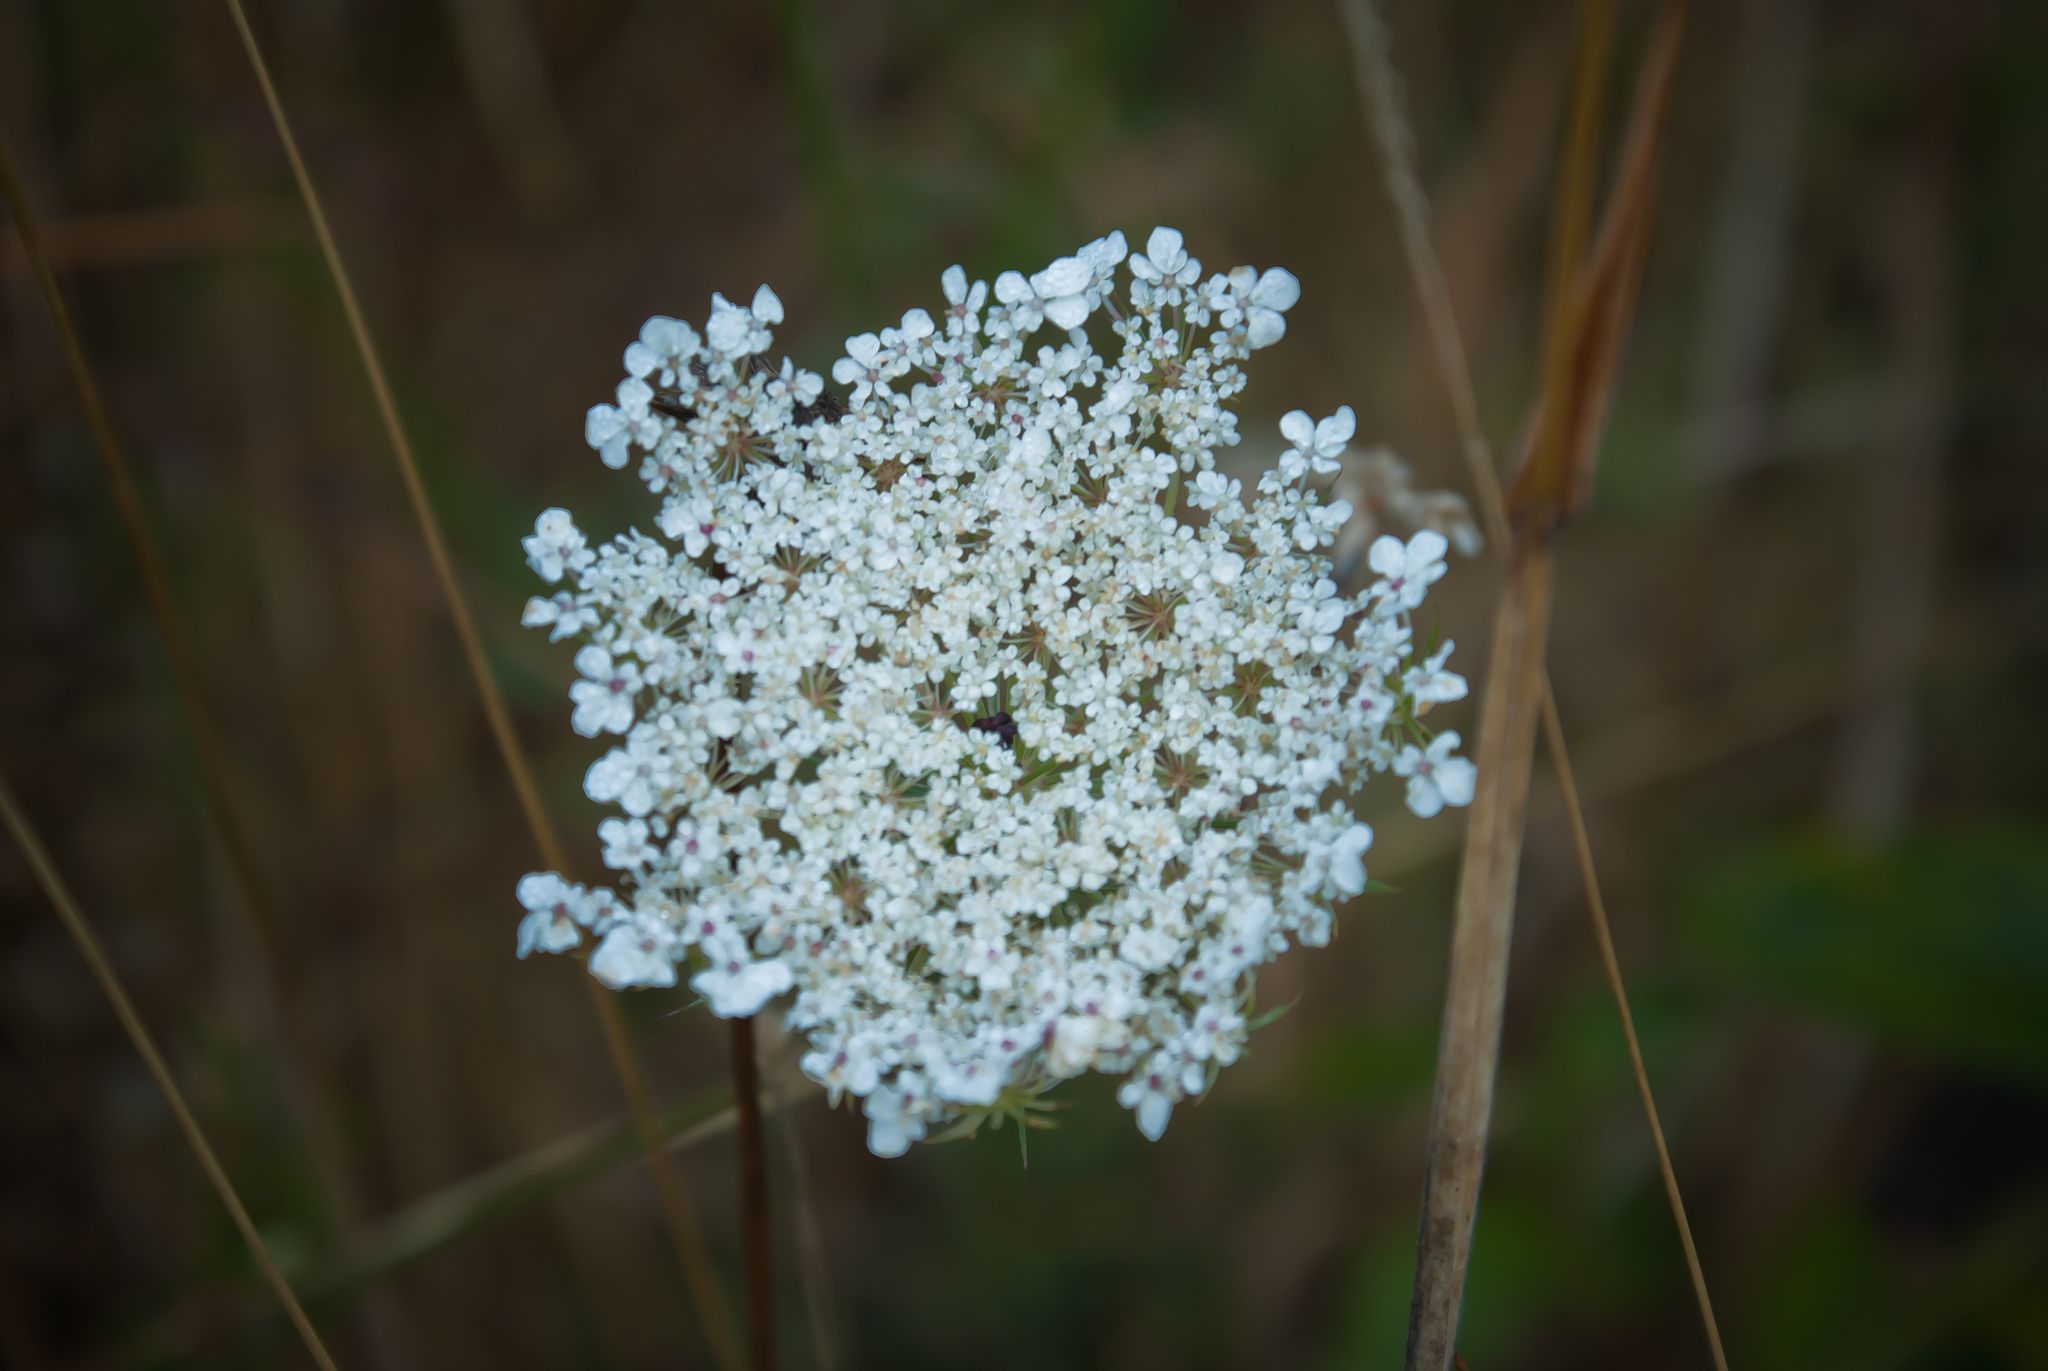 https://flic.kr/p/d7uAq7   WA Wildflowers   Taken near Woodland, WA and Mt. Saint Helen